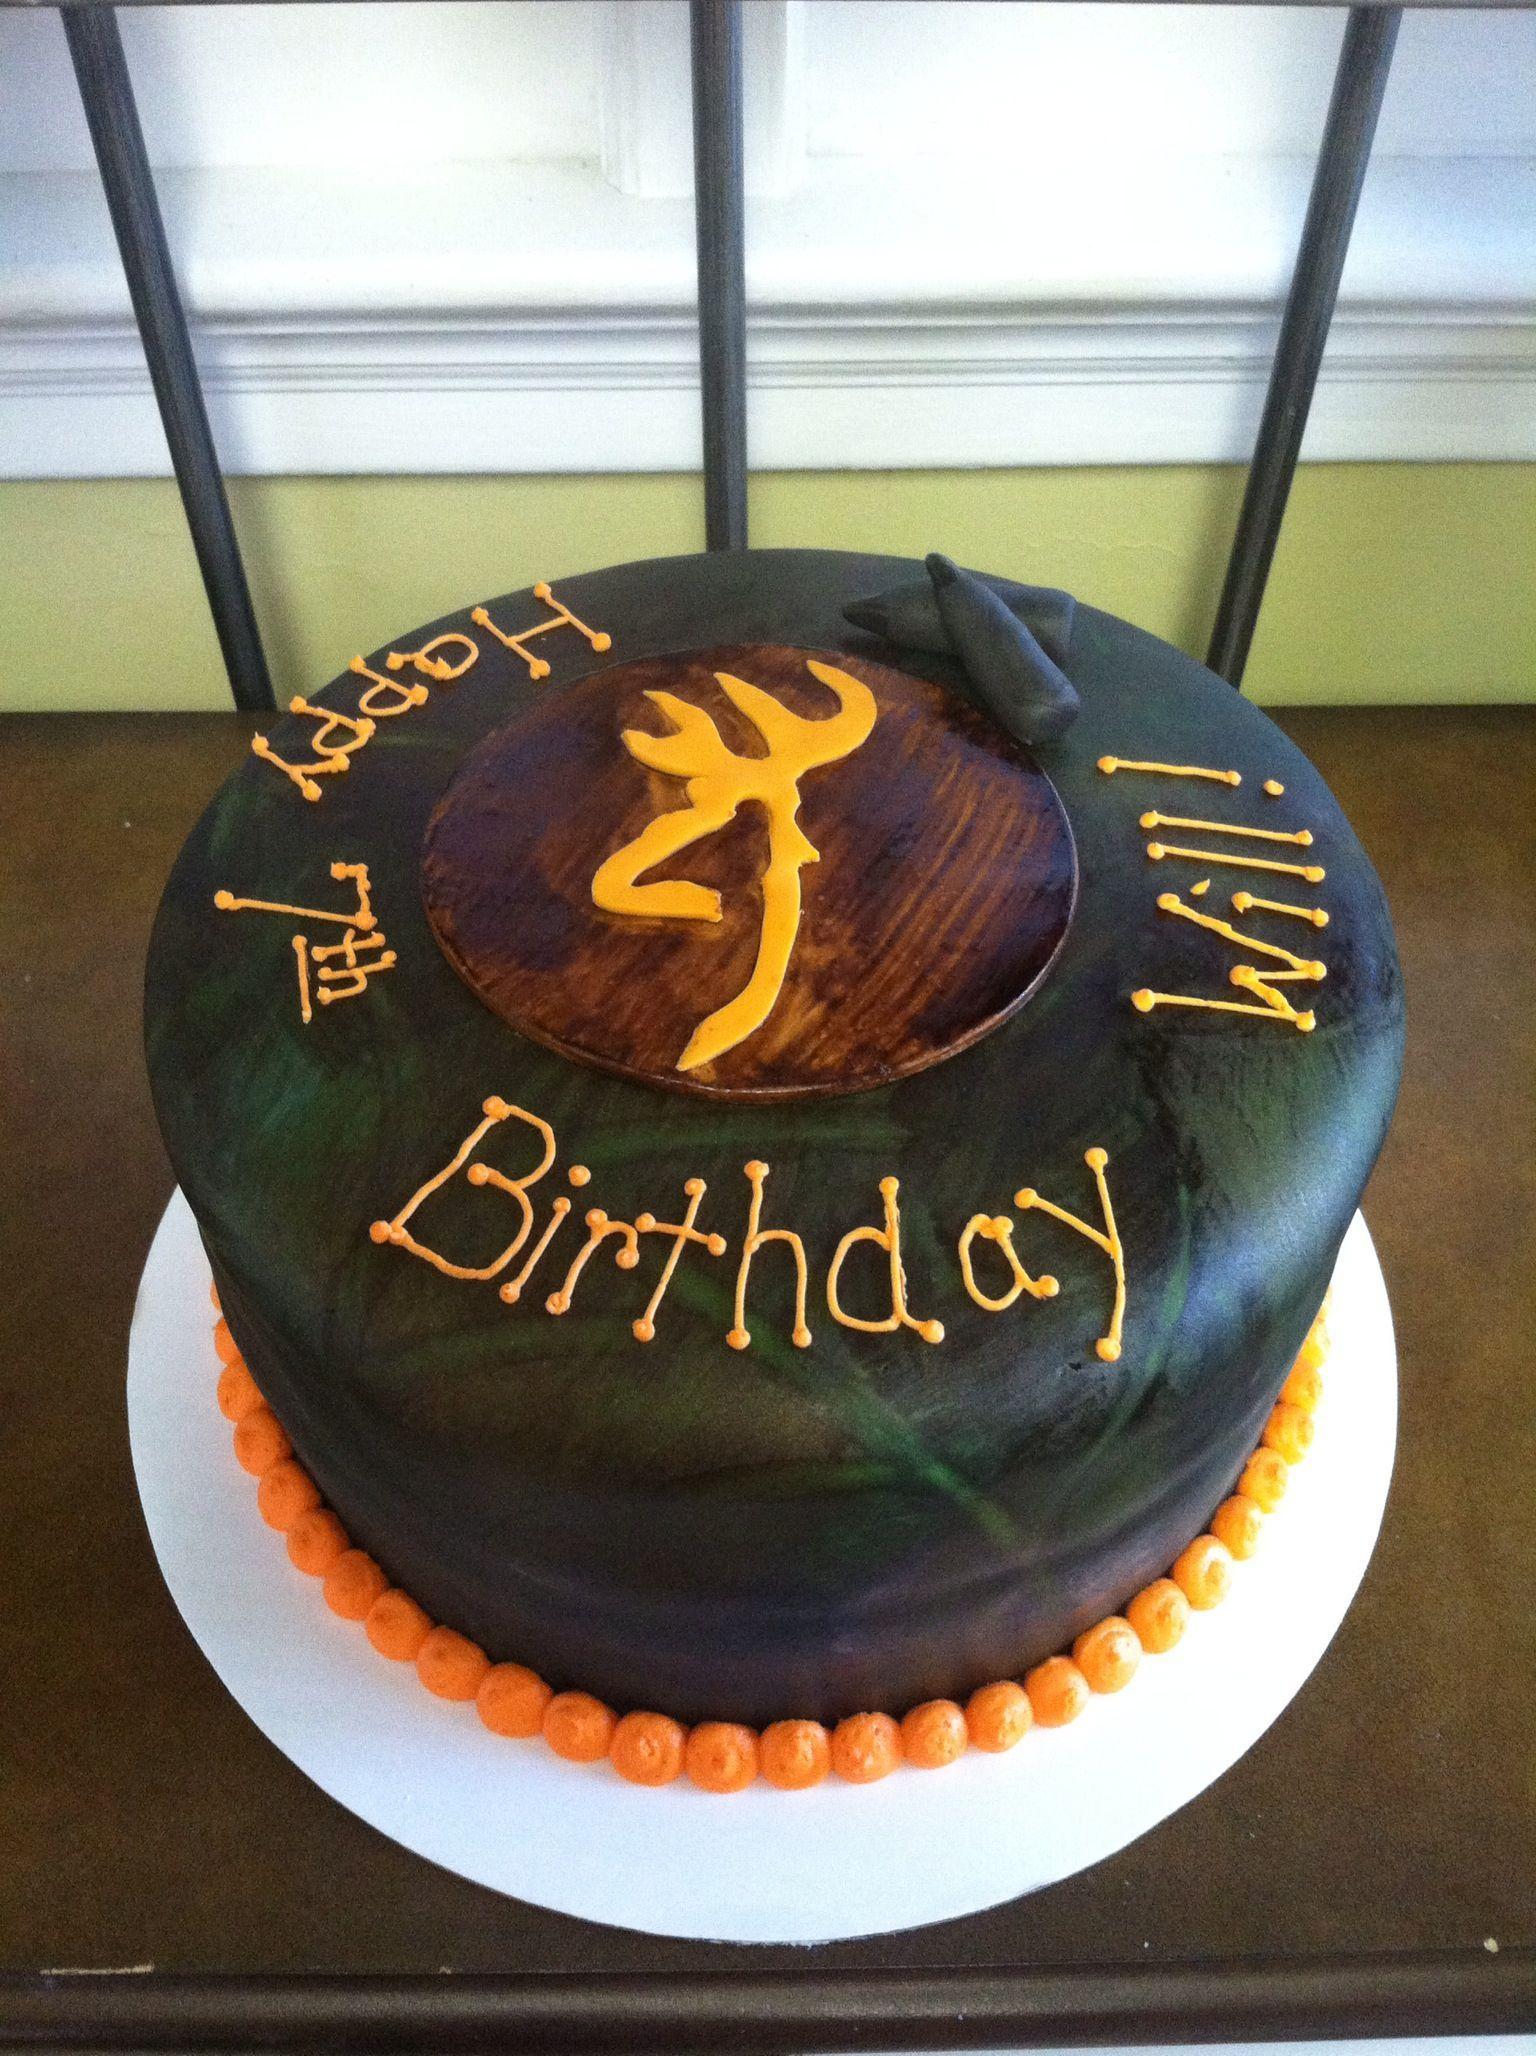 Camo ammo browning cake cakes pinterest browning cake and camo ammo browning cake biocorpaavc Images